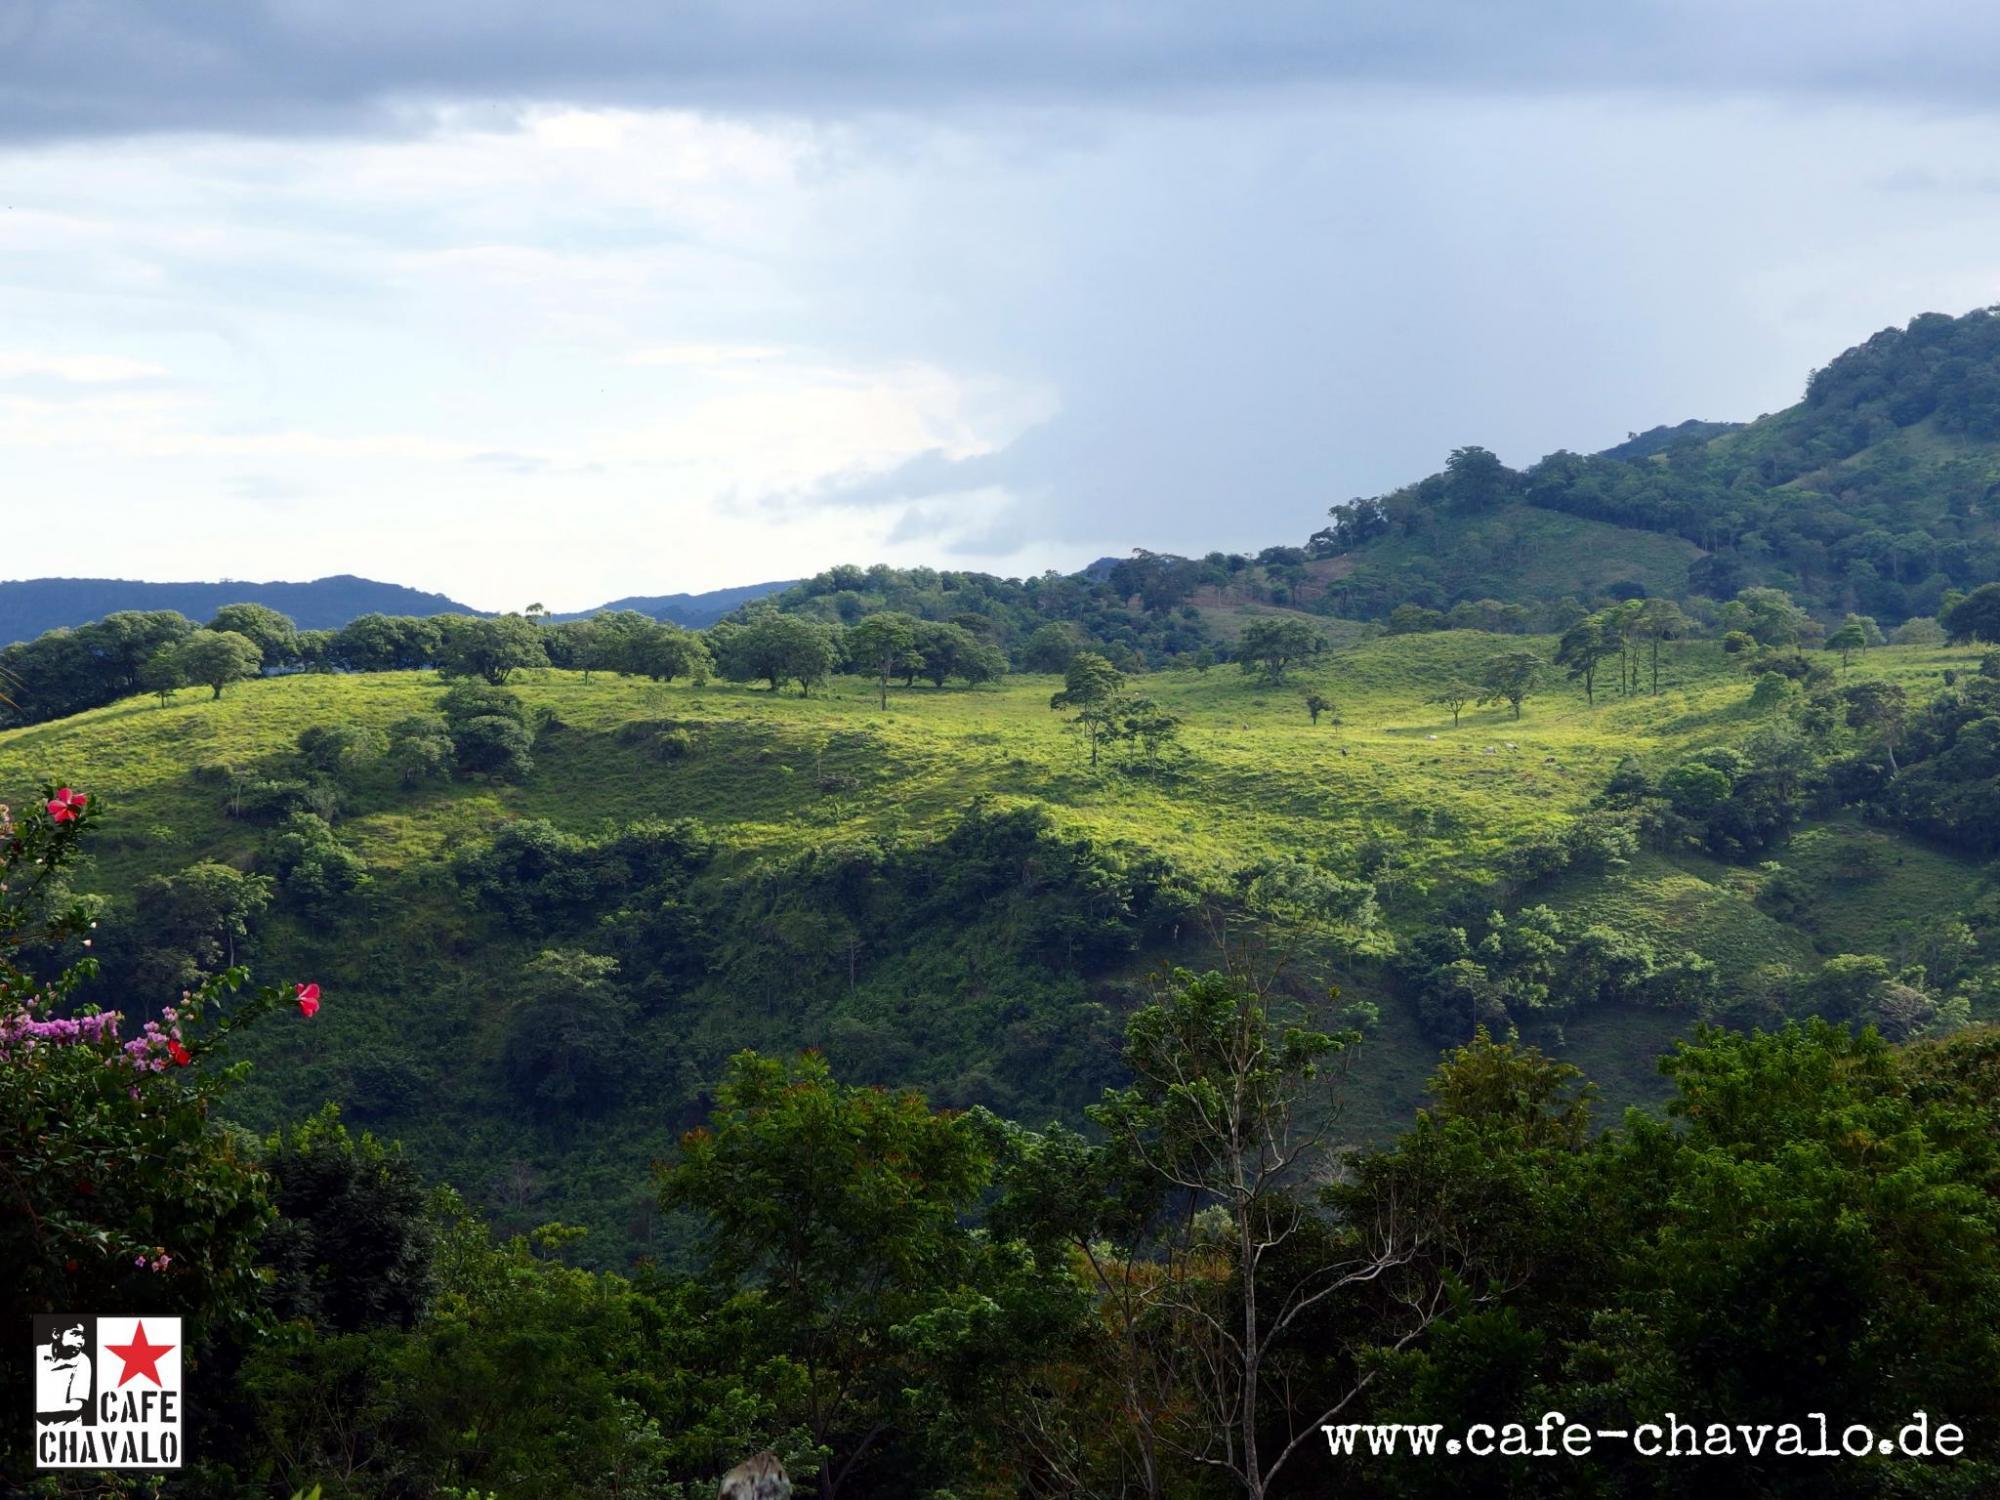 CHavalo landschaft